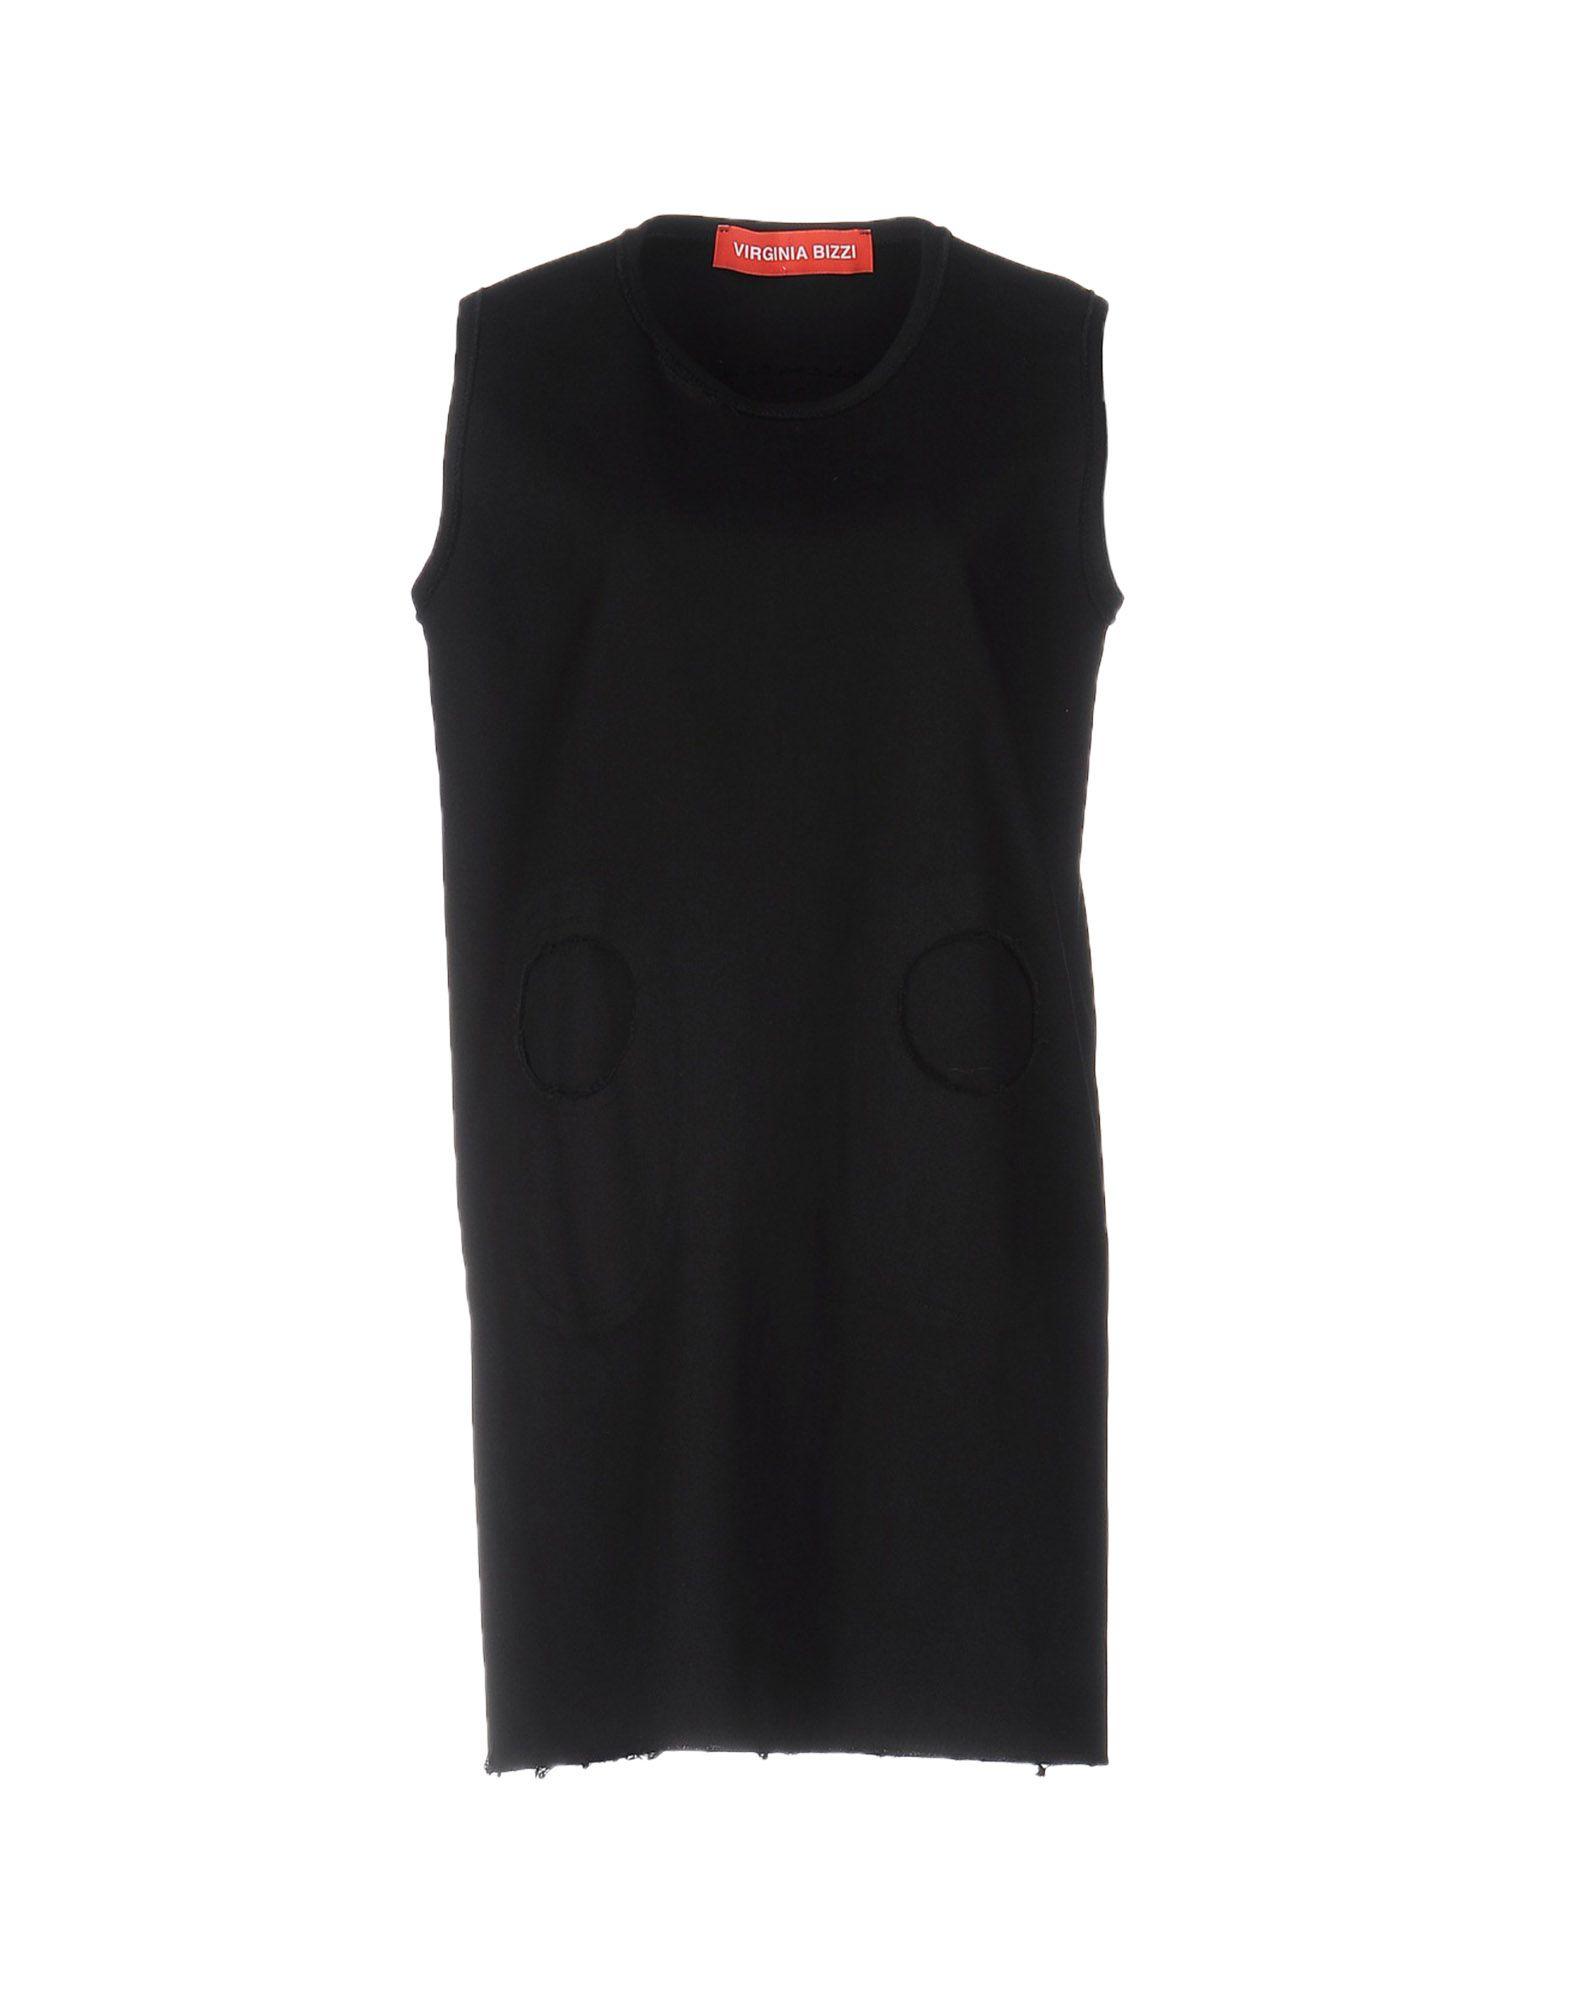 VIRGINIA BIZZI Короткое платье цена и фото